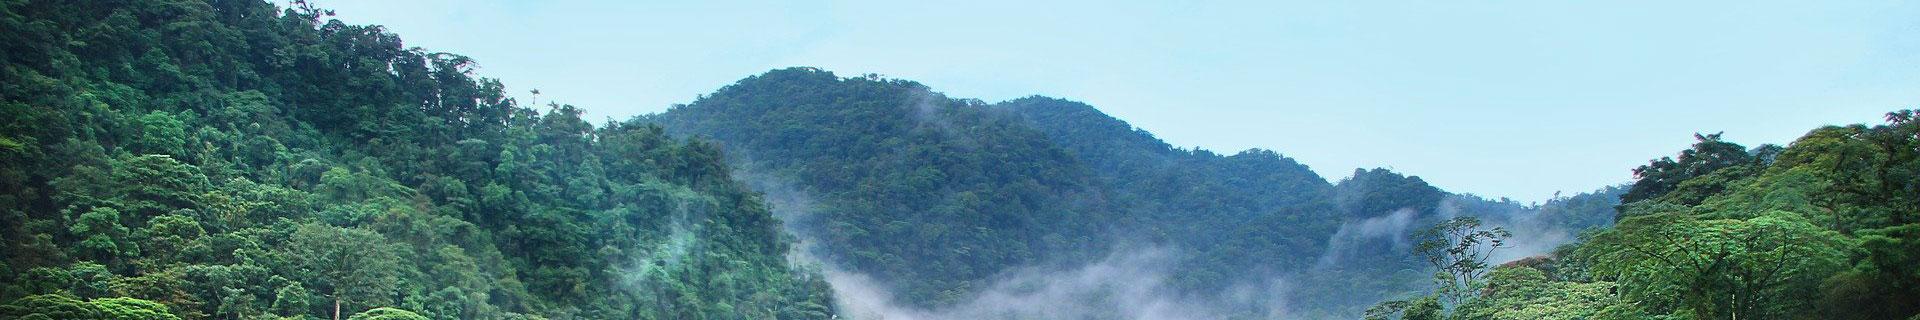 enduroreise-viaduro-motorrad-tour-costa-rica-slider-04